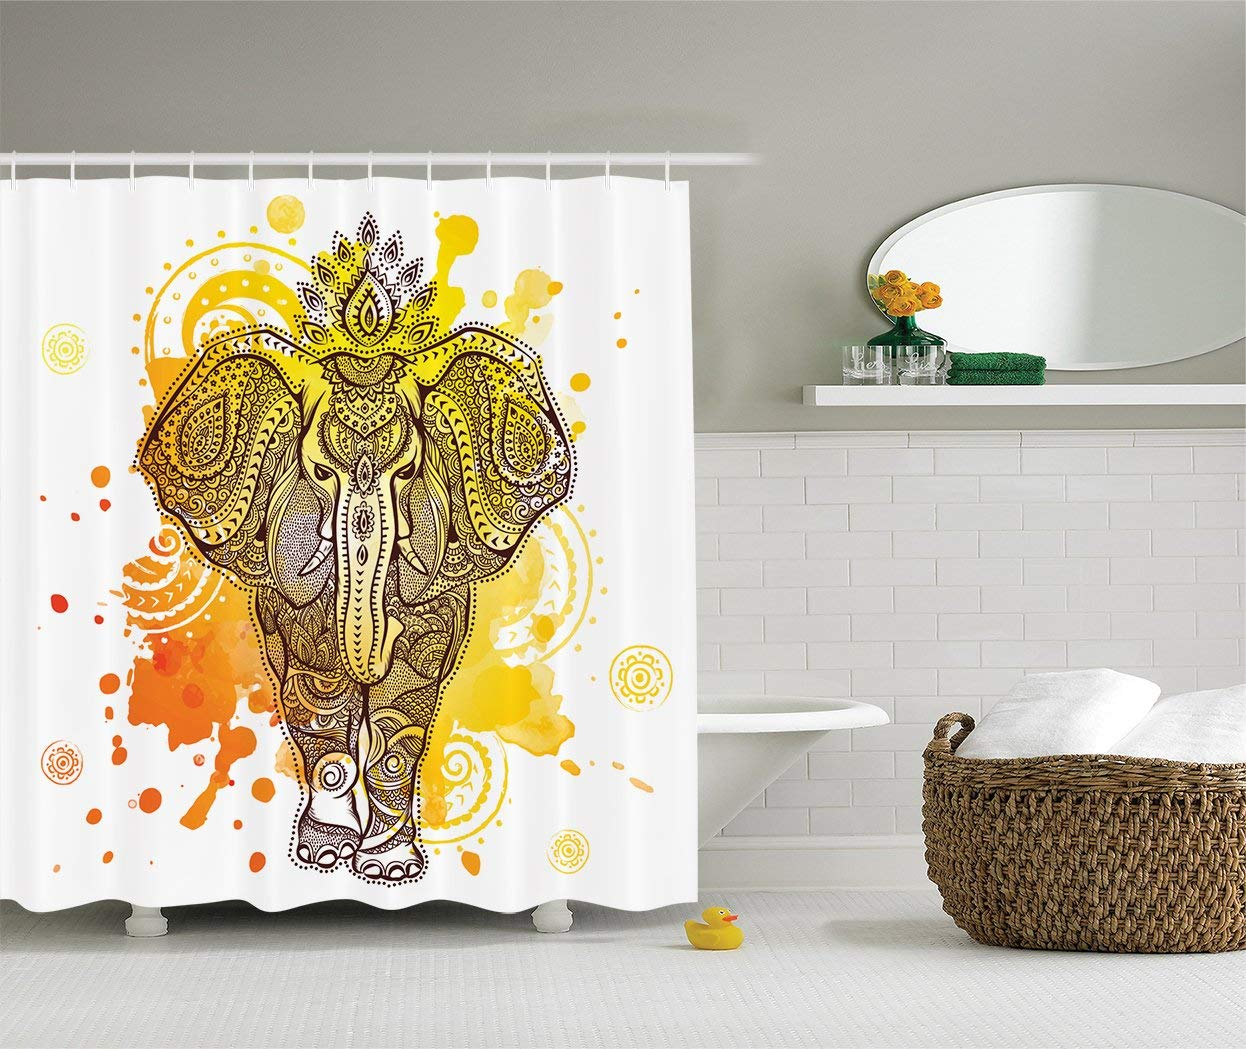 Watercolor Splash Art Decor Shower Curtain Vintage Wild Aztec ...